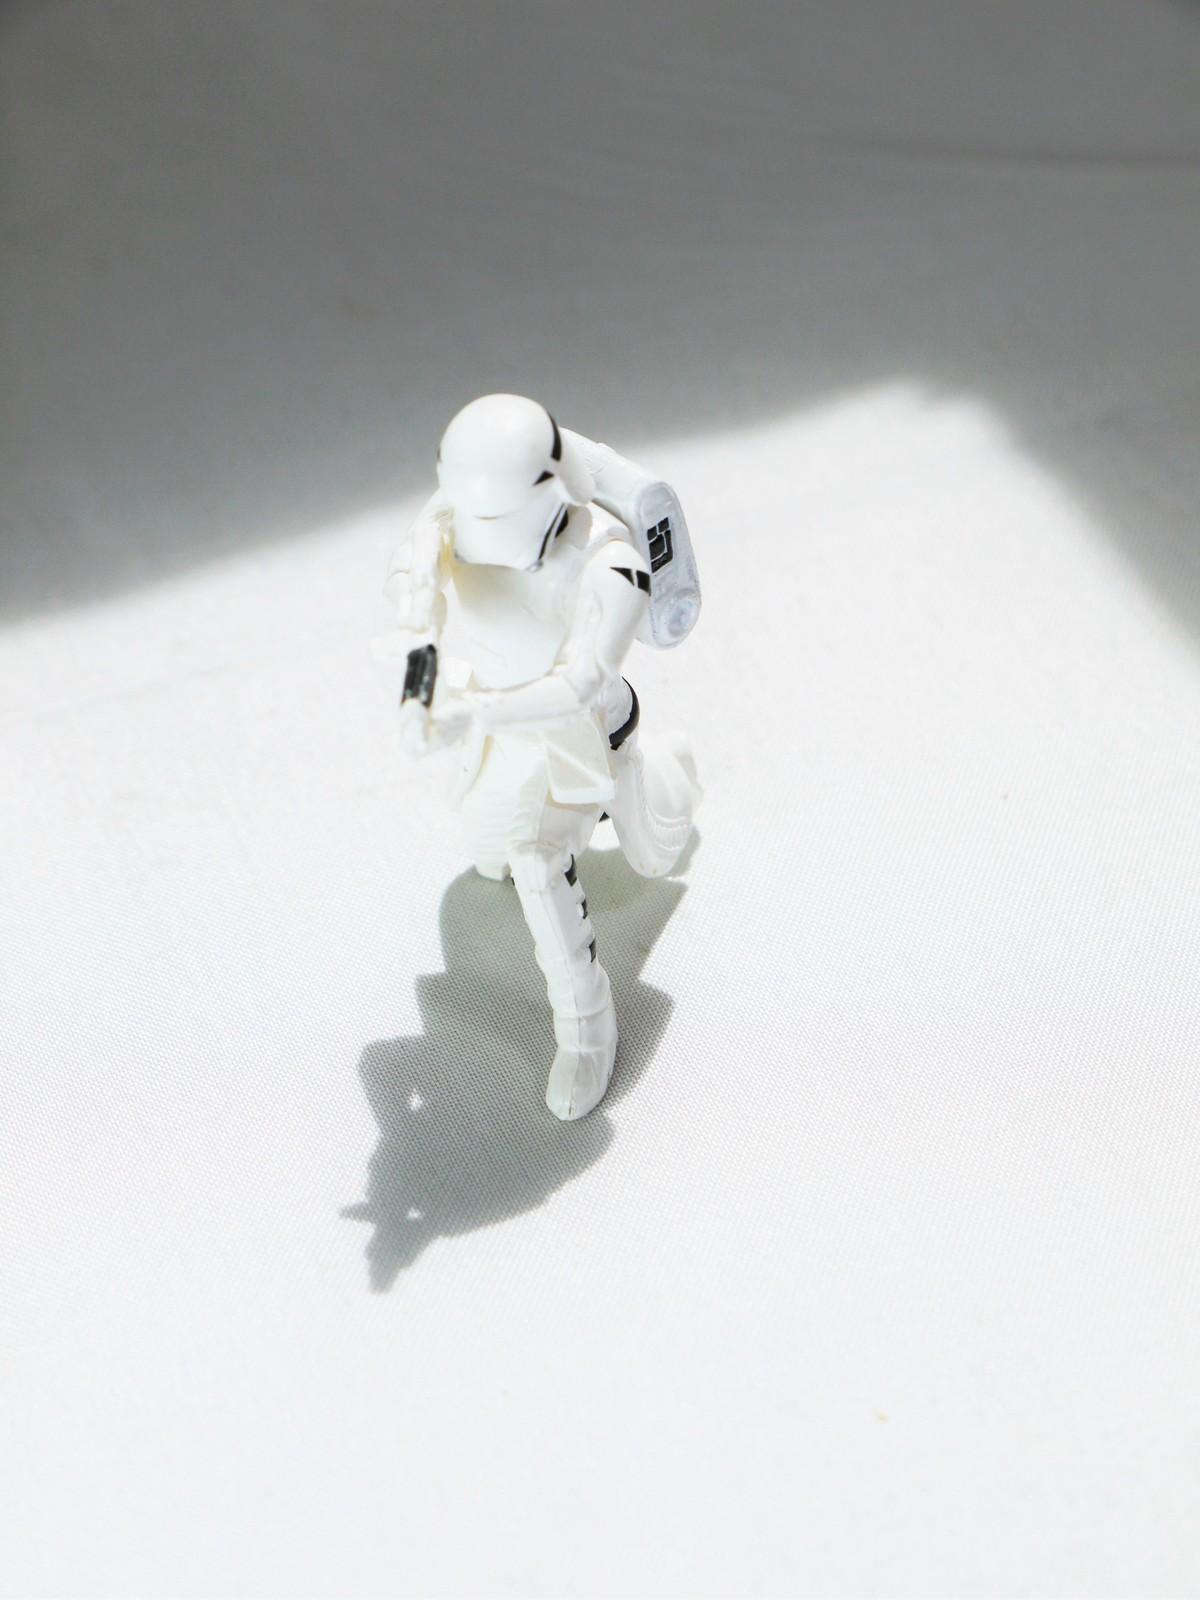 ARTS STAR WARS Characters GACHA GALAXY DESKTOP FIRST ORDER Phase 2 Snowtrooper